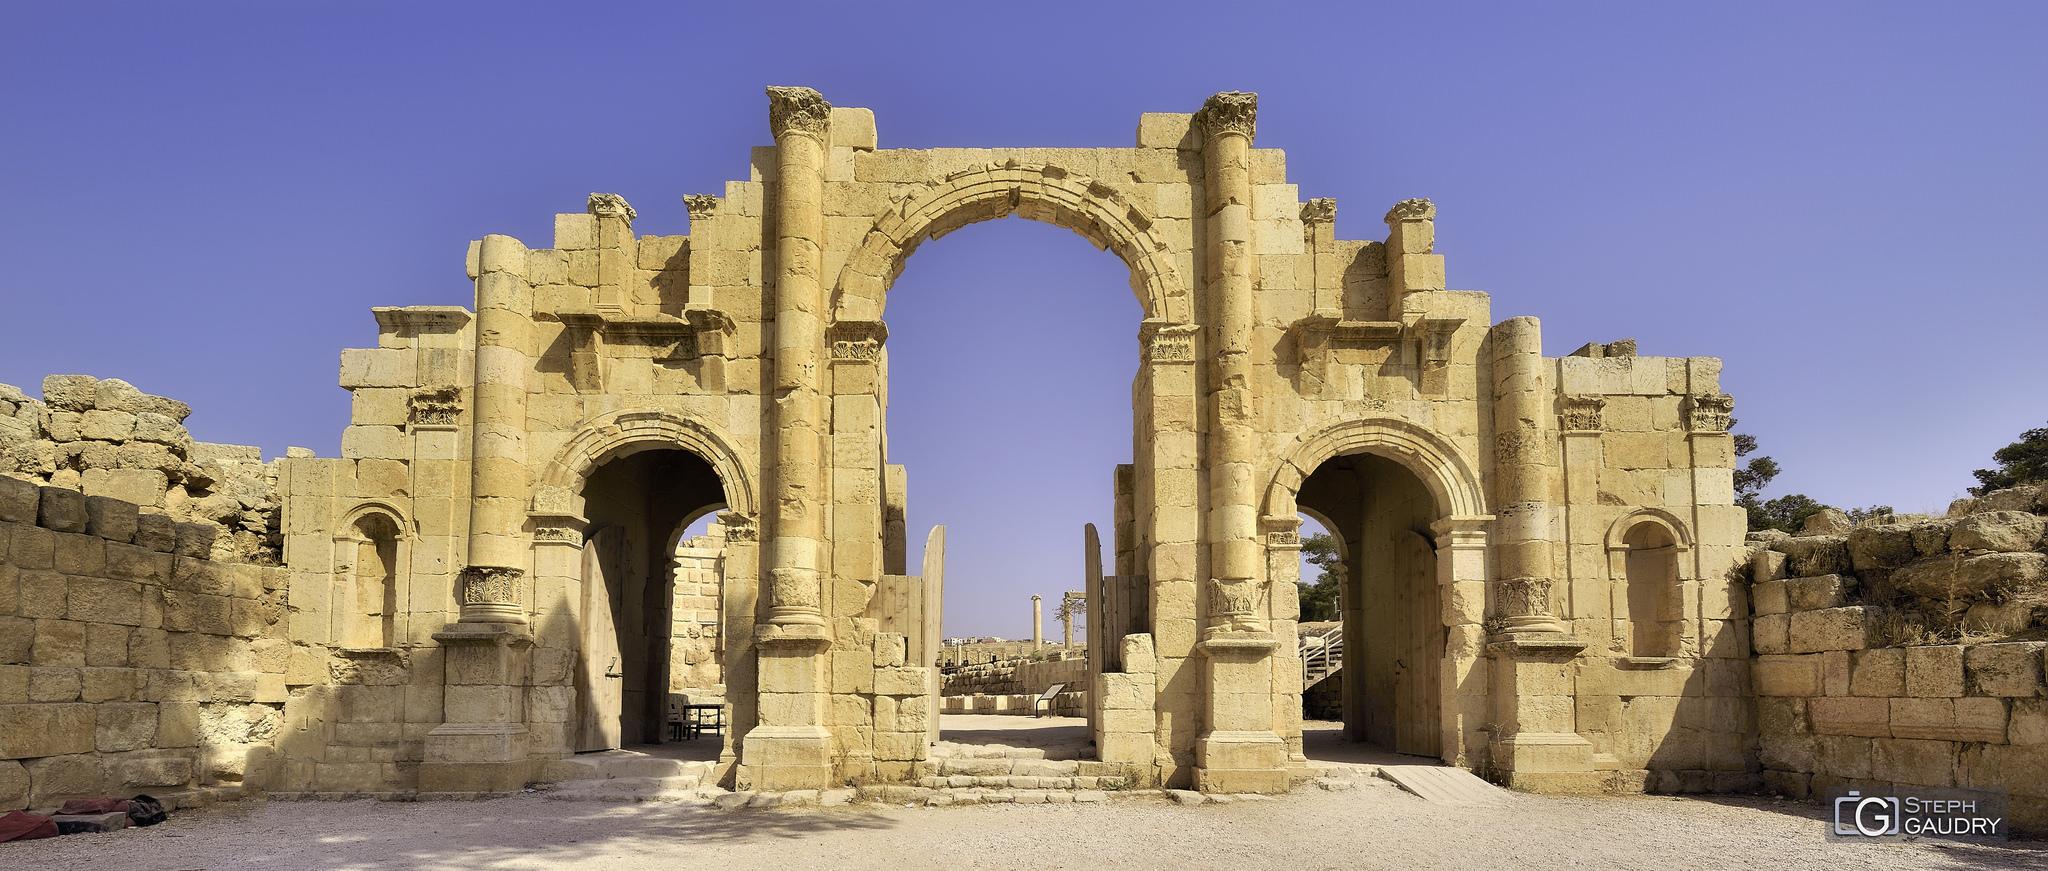 Jerash - La porte Sud [Klik om de diavoorstelling te starten]